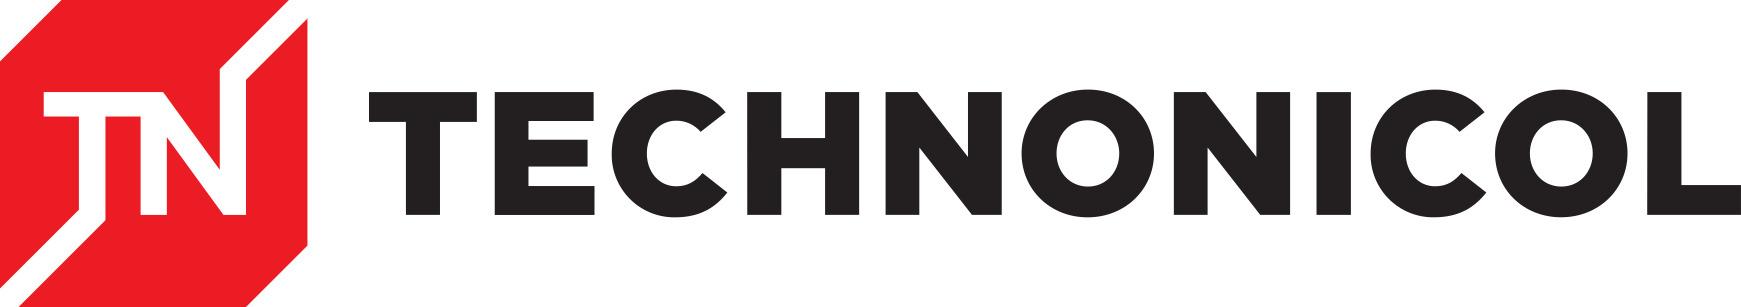 logo-full-decc434252494499bd7d69a578919fd5